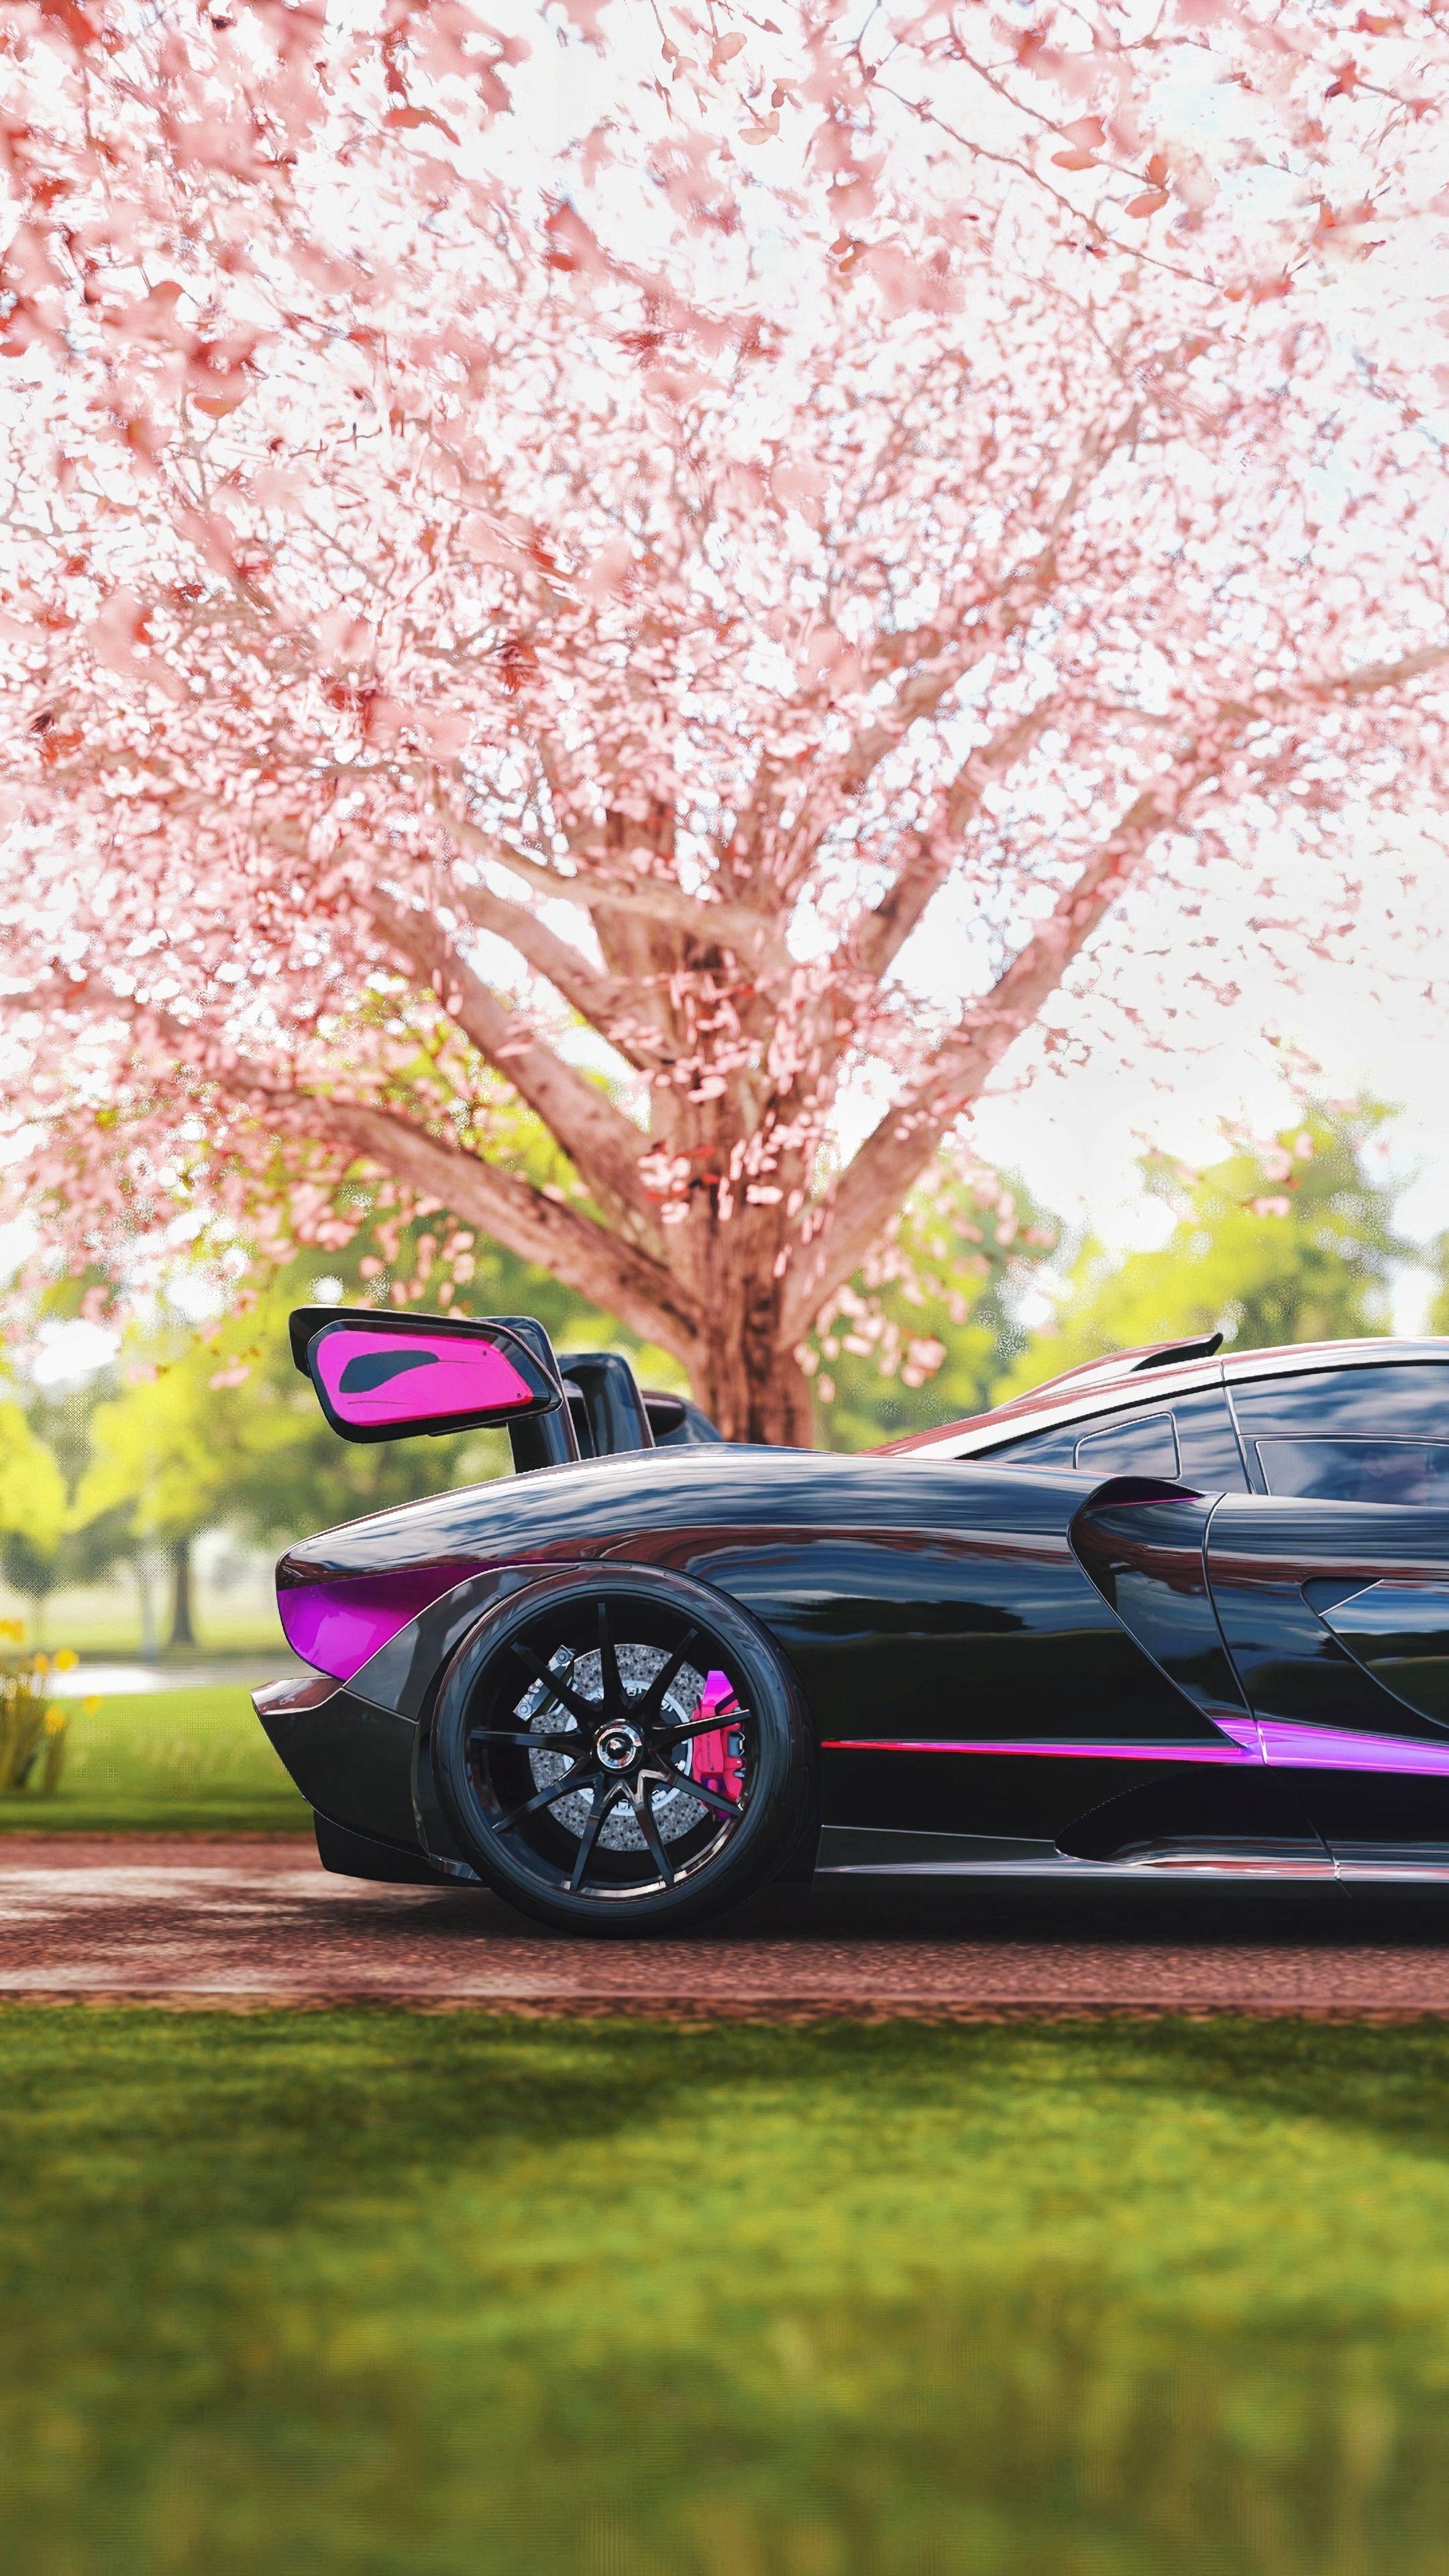 90595 Screensavers and Wallpapers Sakura for phone. Download Sports, Races, Mclaren, Sakura, Cars, Sports Car, Side View, Mclaren Senna pictures for free